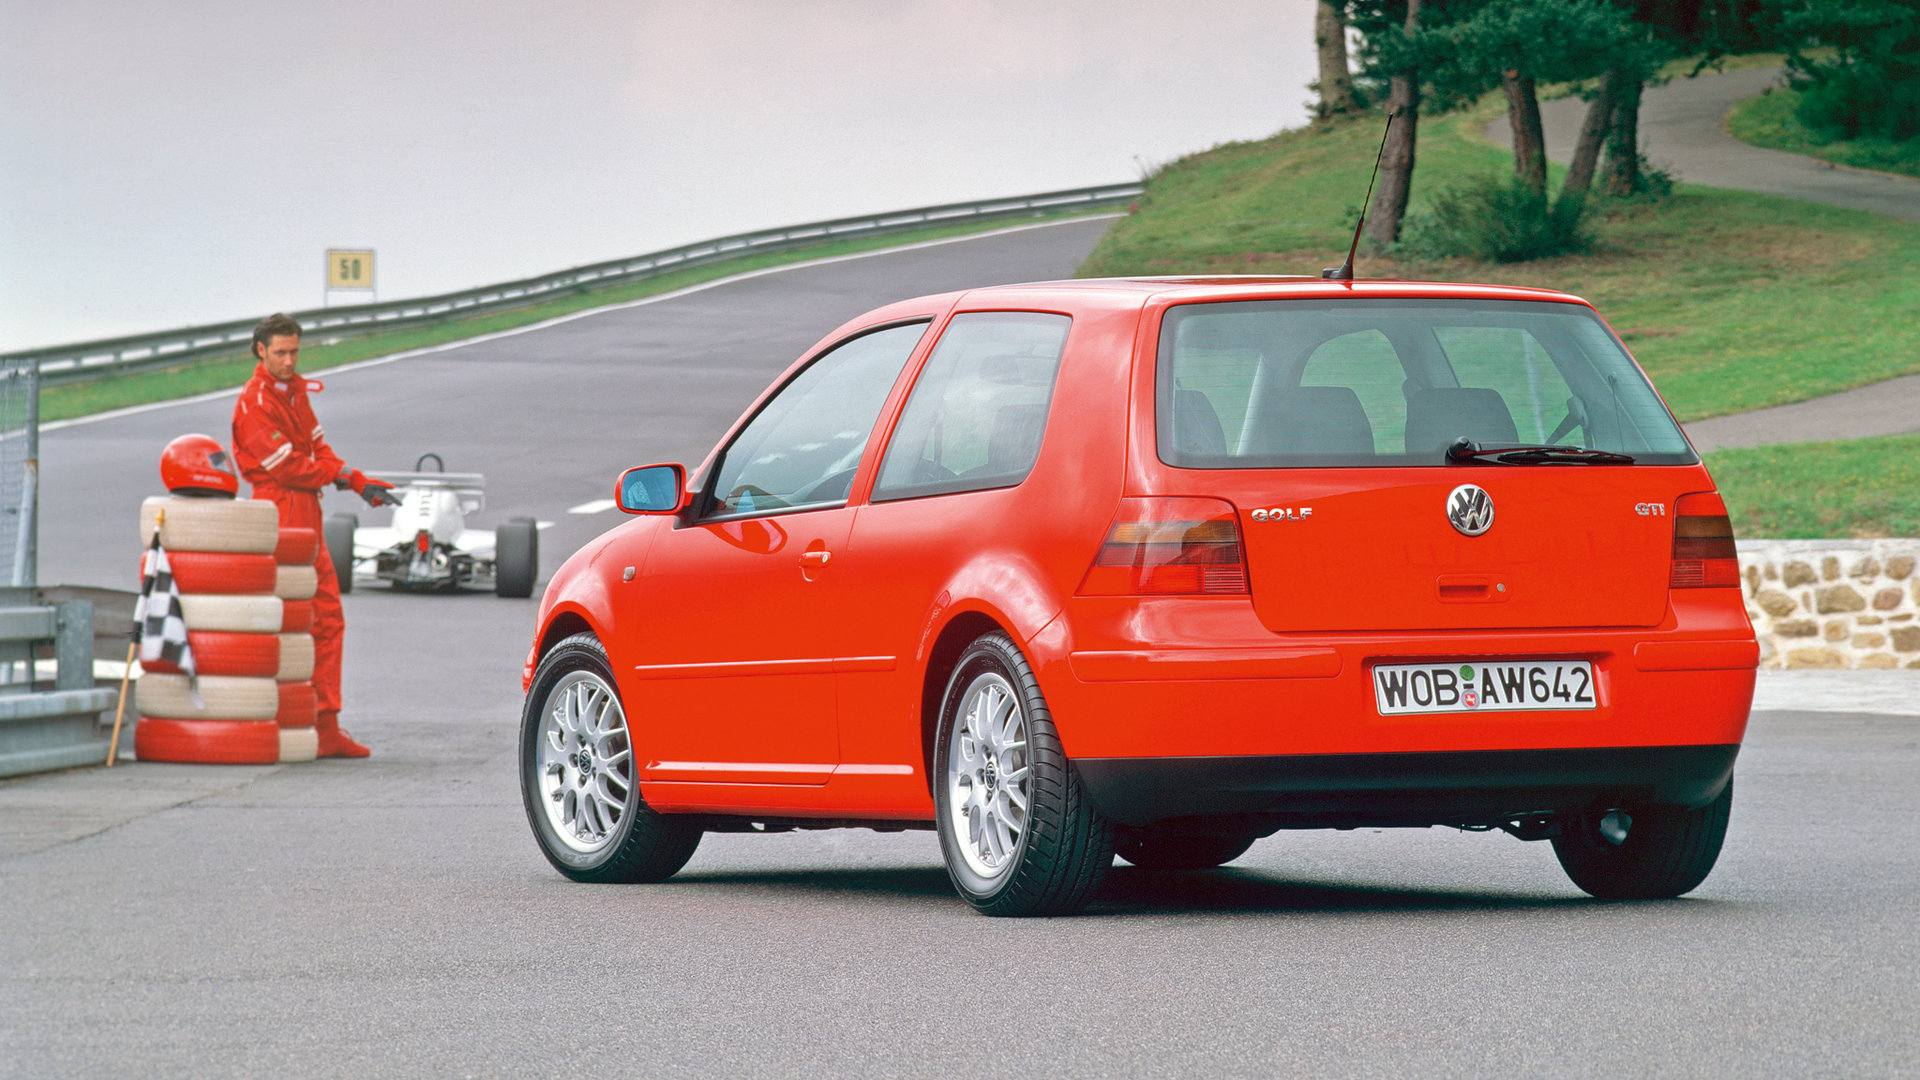 Volkswagen Golf GTI (1J)